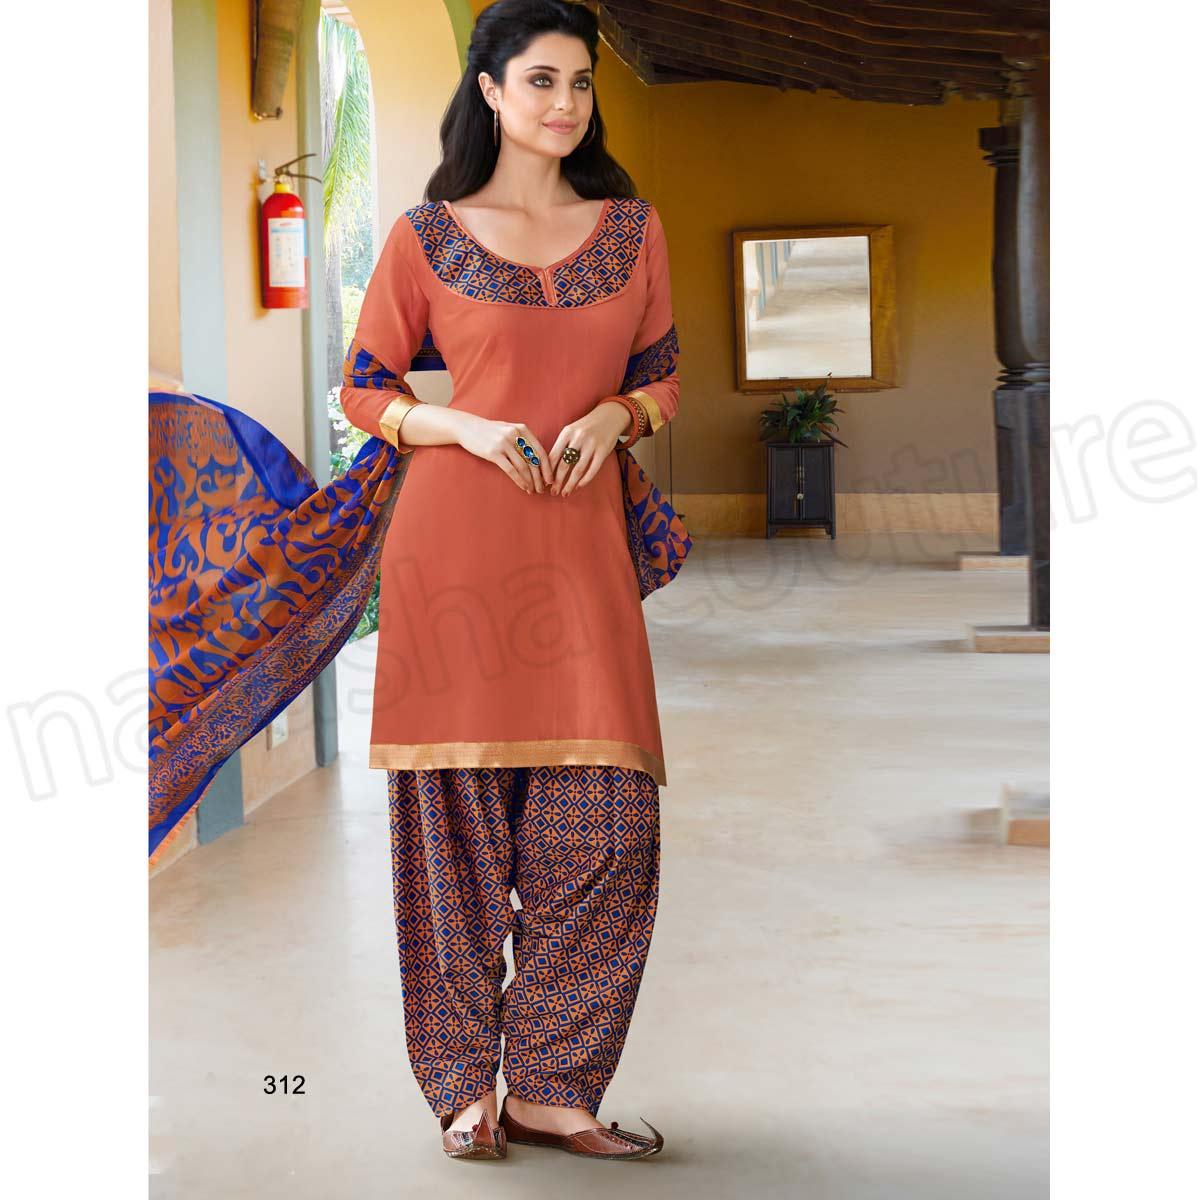 Latest Women Fashion Natasha Couture Shalwar Kameez Auto Eriba Caravan Wiring Diagram